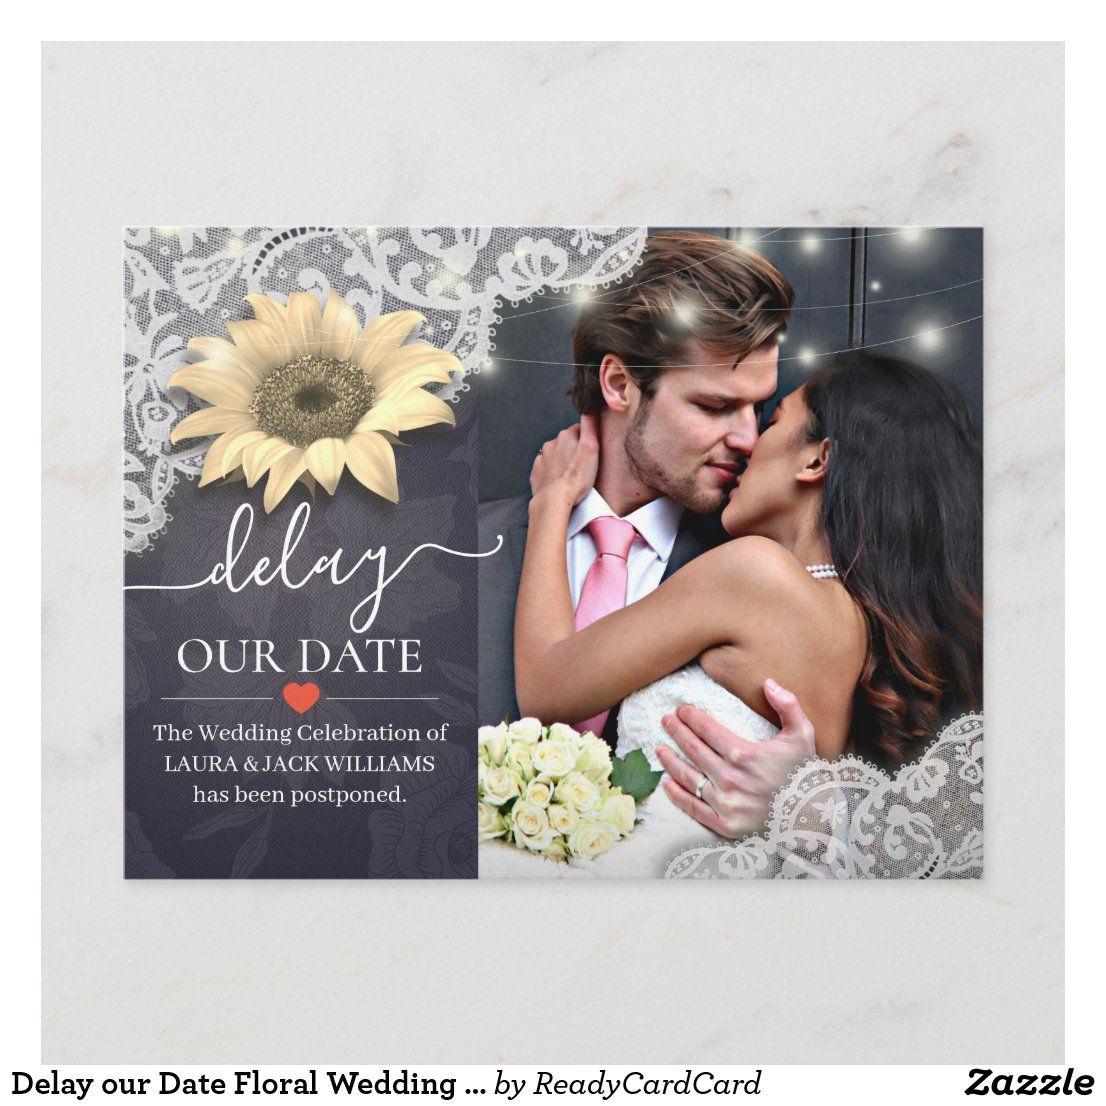 Delay our date floral wedding postponement photo